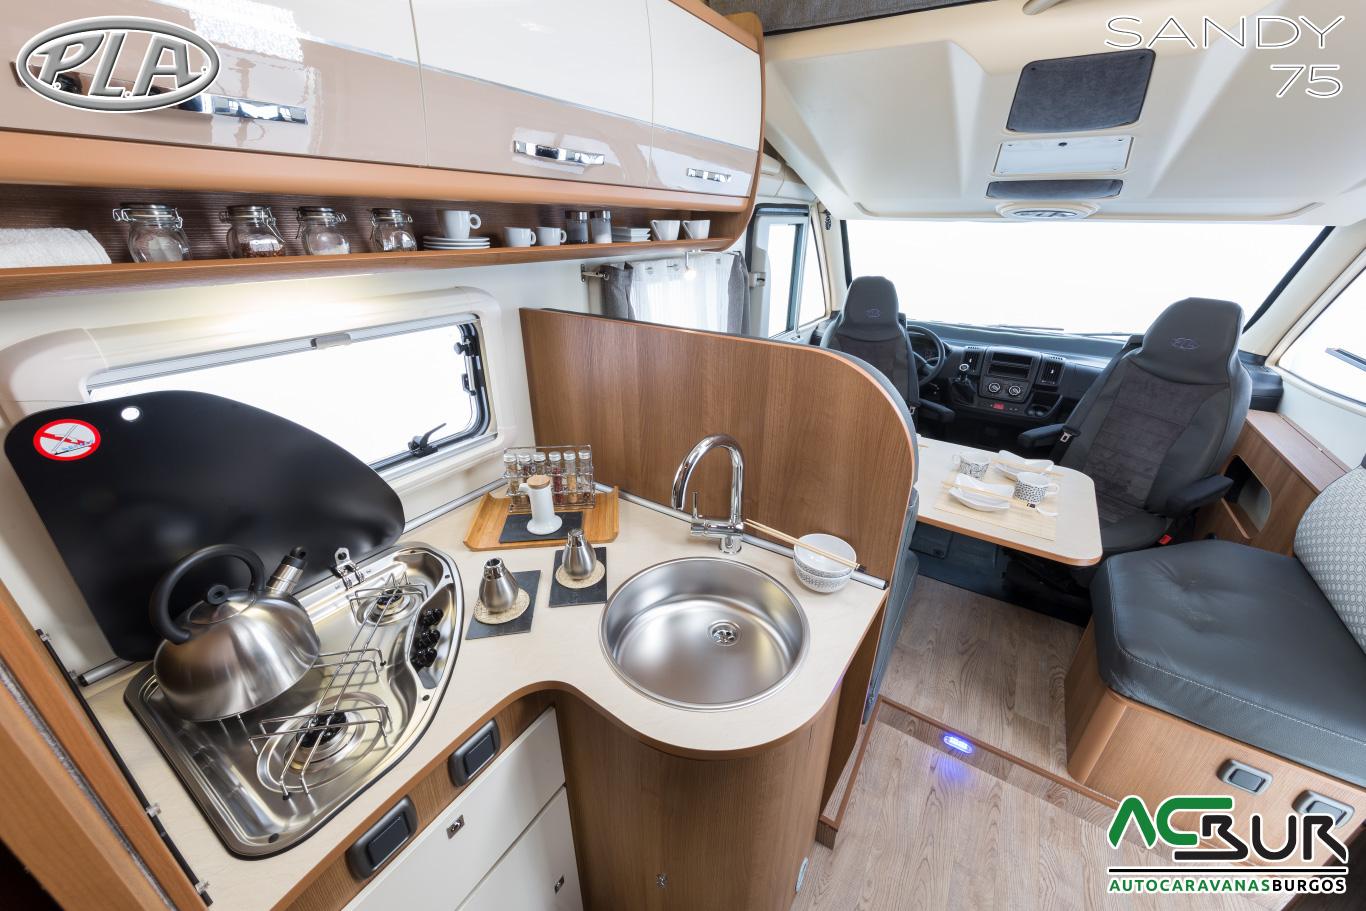 Alquilar Autocaravana integral en Cantabria cocina